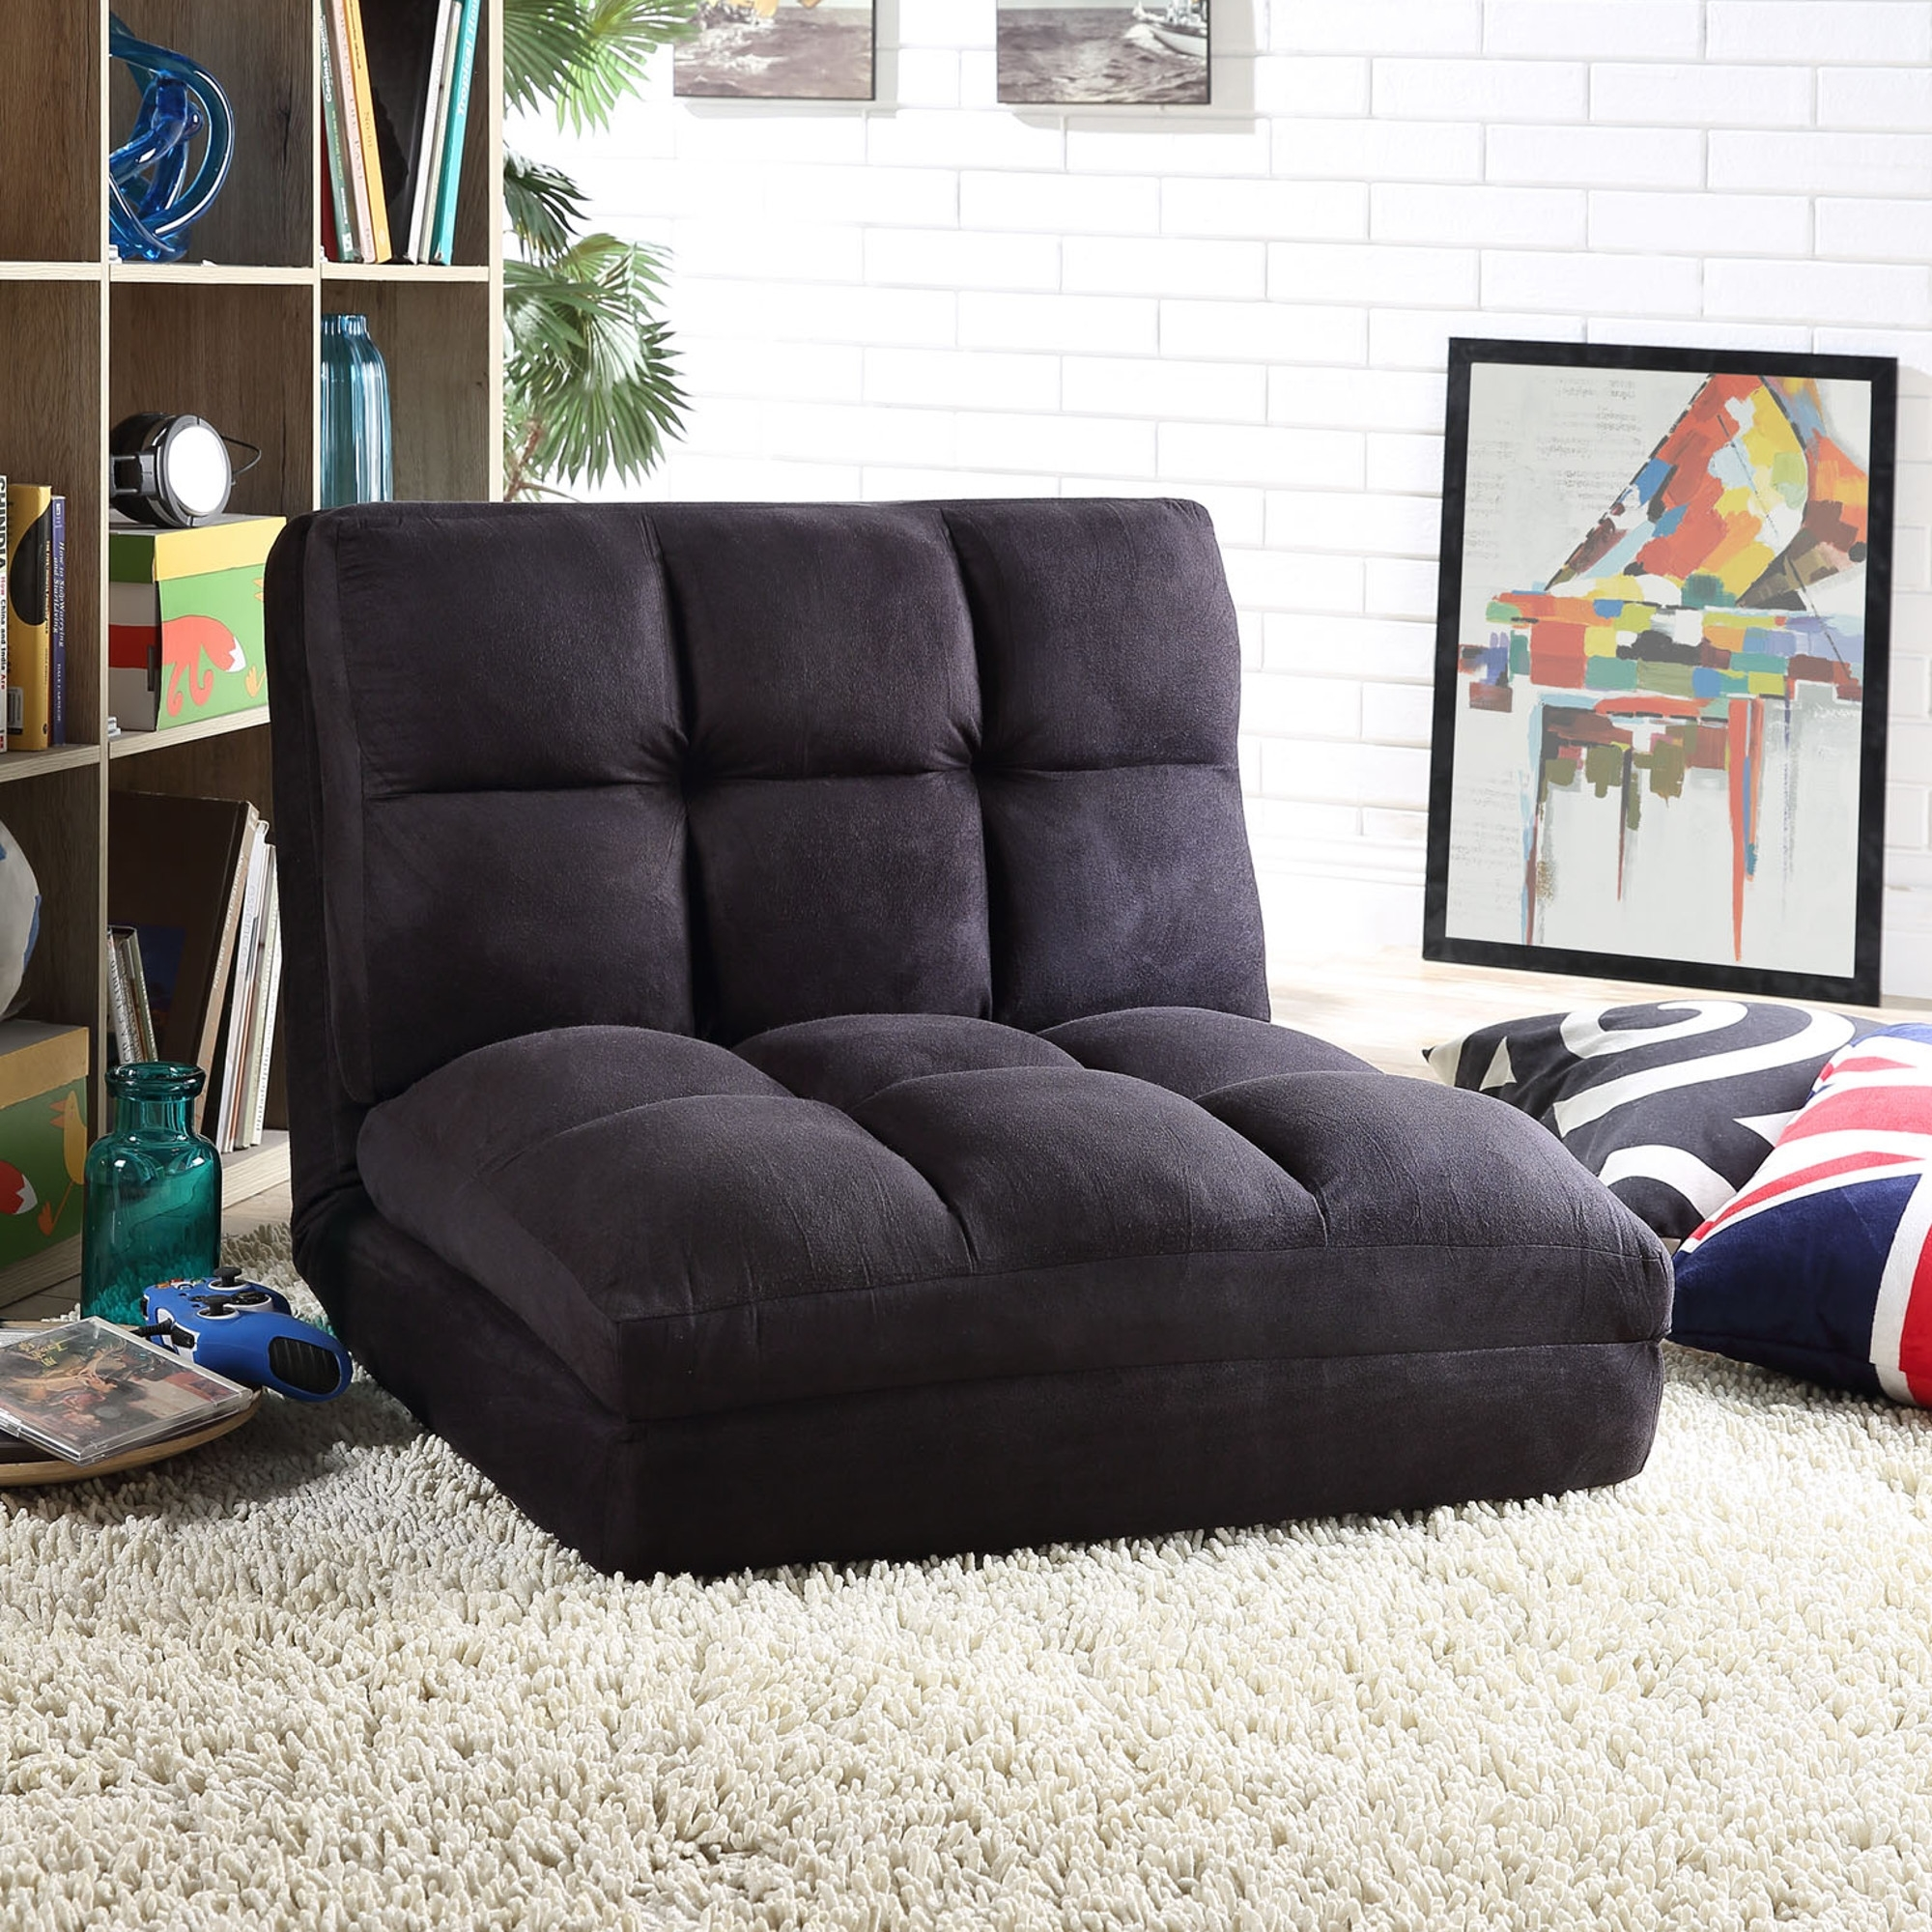 - Loungie Beige Microsuede Flip Chair - Sleeper Dorm Bed Lounger